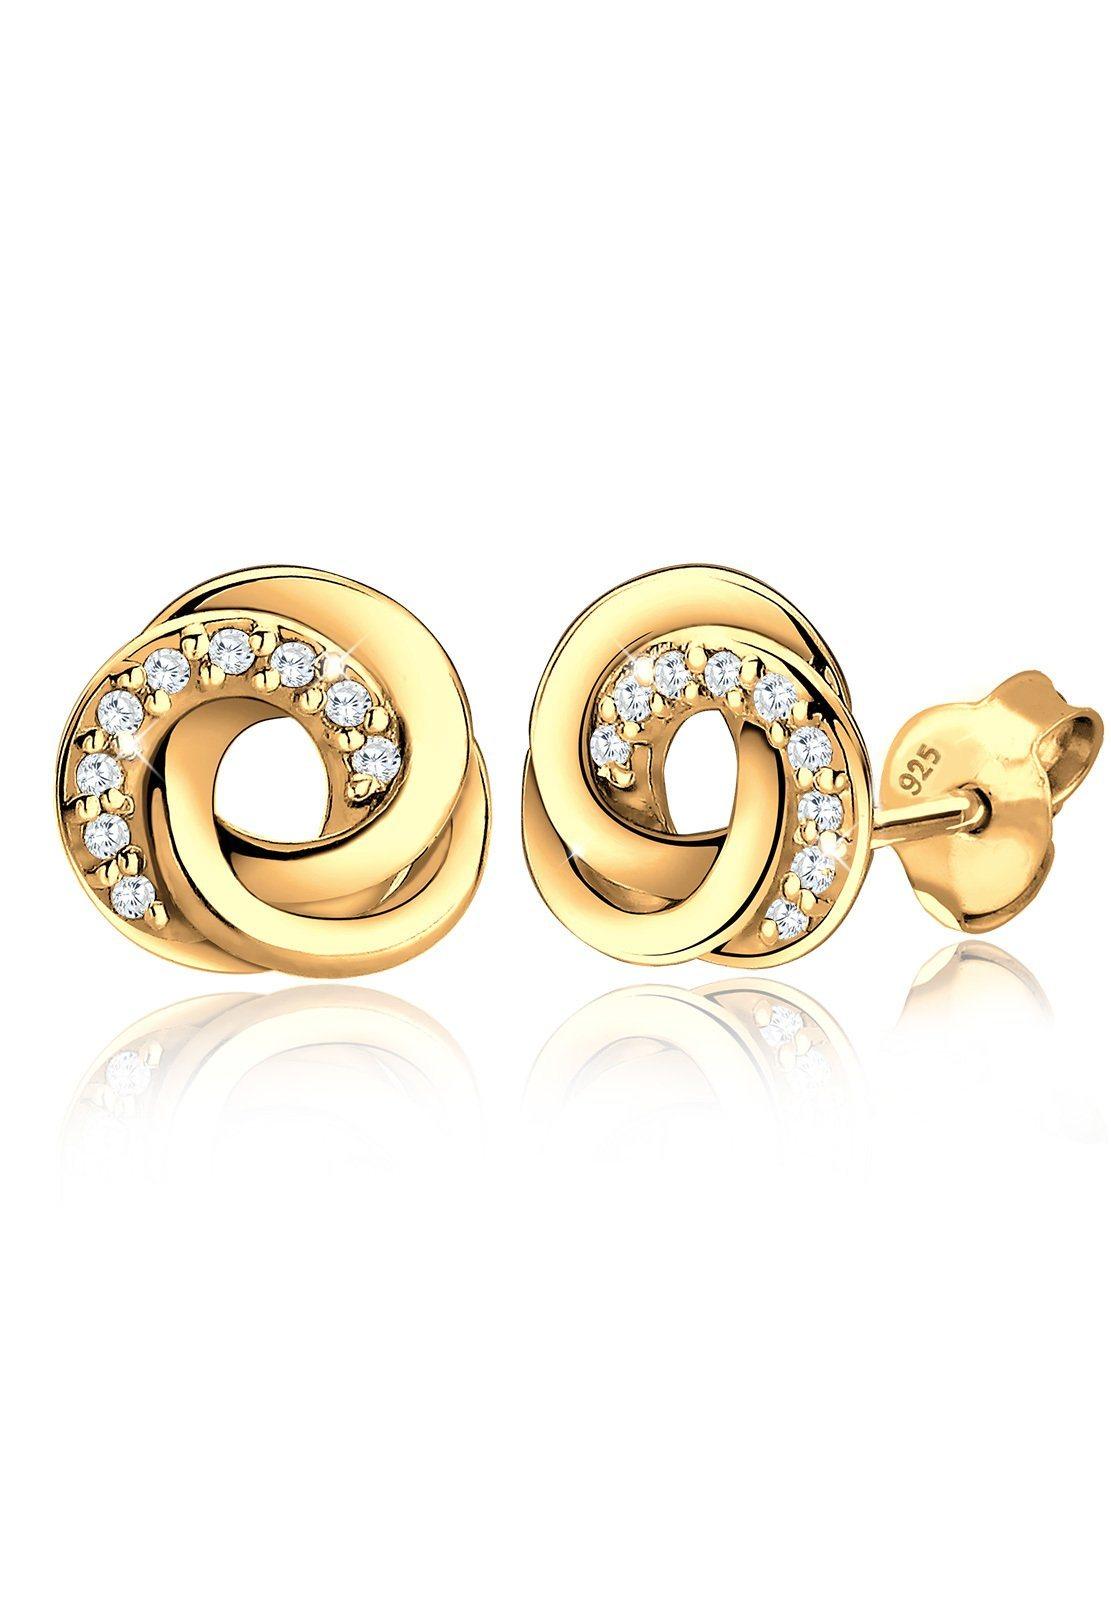 Goldhimmel Ohrringe »Spirale Zirkonia Elegant 925 Silber vergoldet« | Schmuck > Ohrschmuck & Ohrringe > Ohrstecker | Silber - Weiß | GOLDHIMMEL